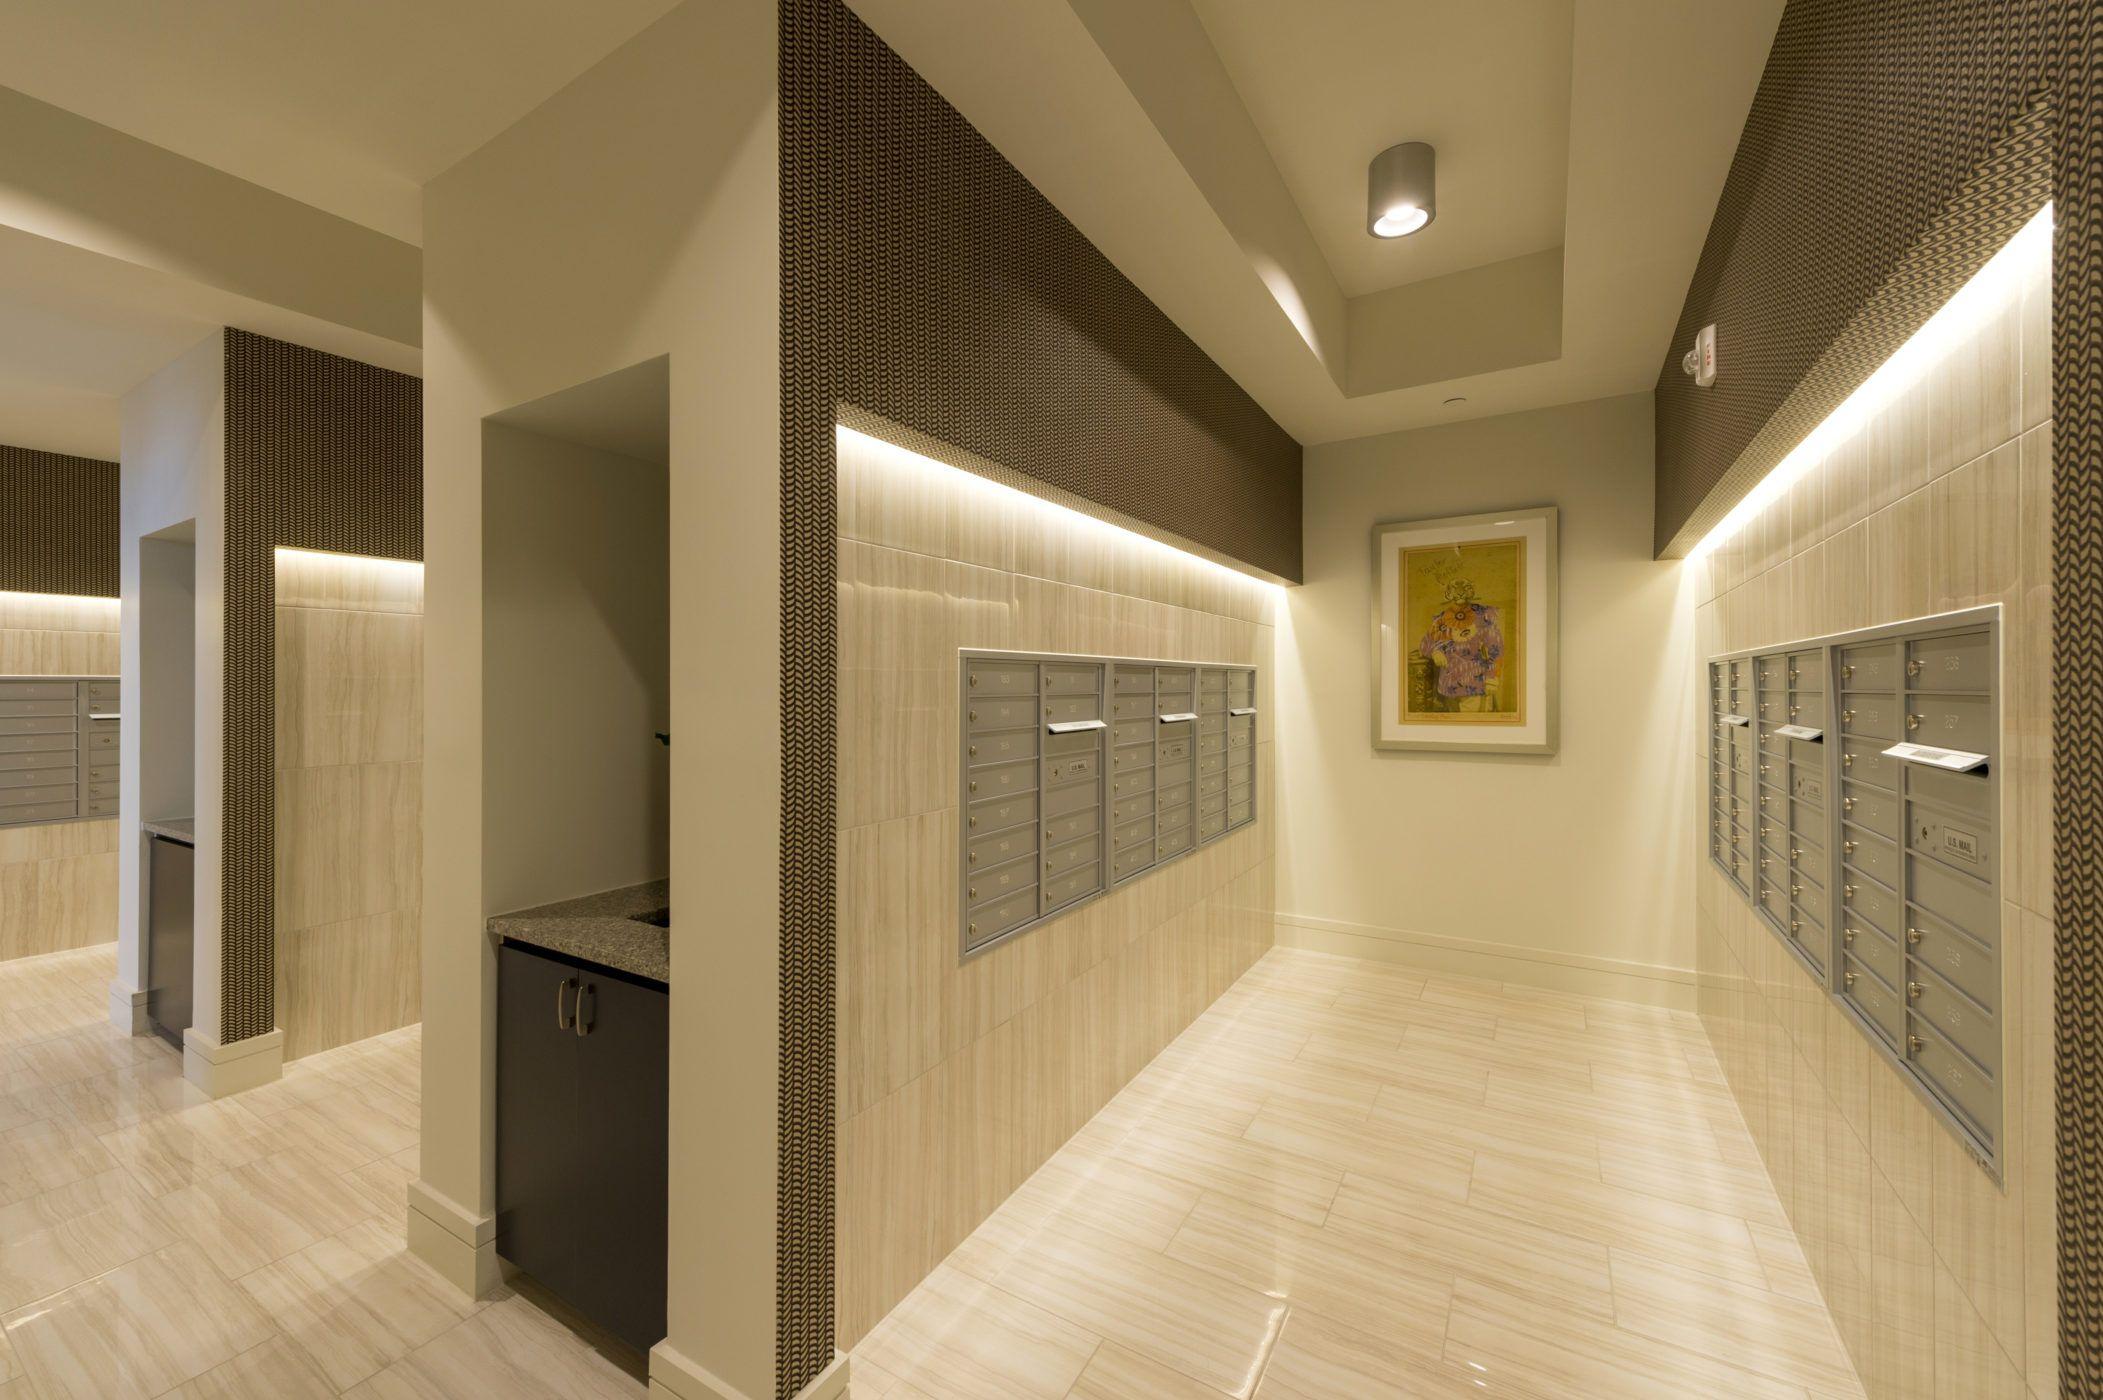 Amenities Alexan Citycentre Houston Apartment Home Decor New Community